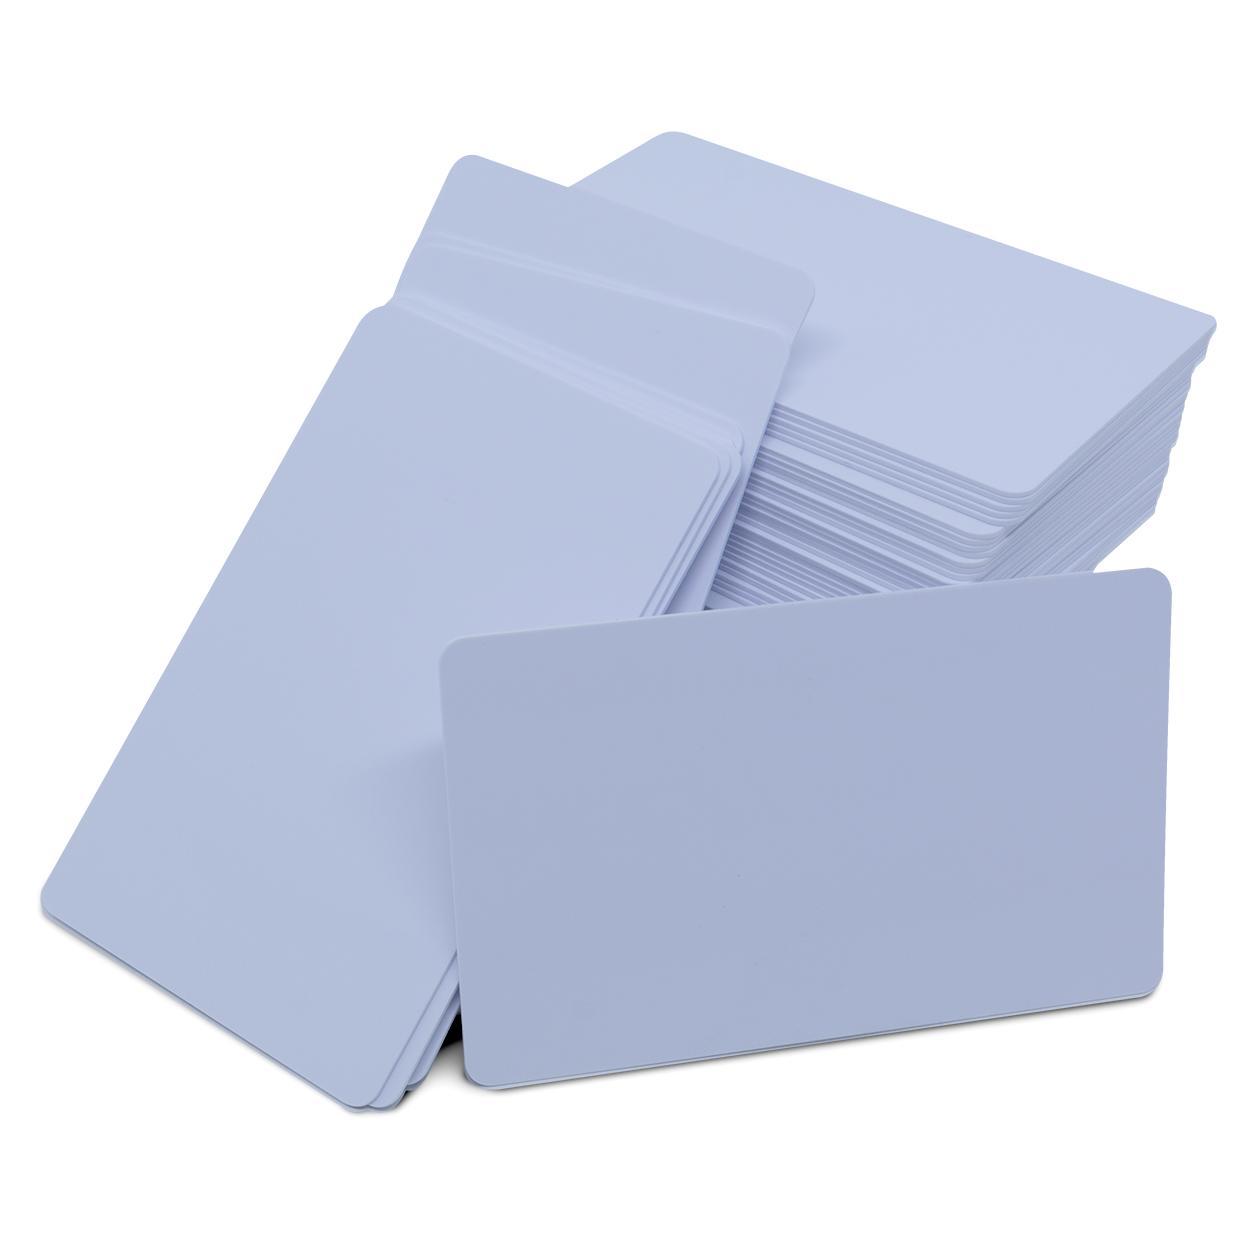 Cartão PVC Branco para Impressão Jato de Tinta - Sem Tarja - 100 Unidades